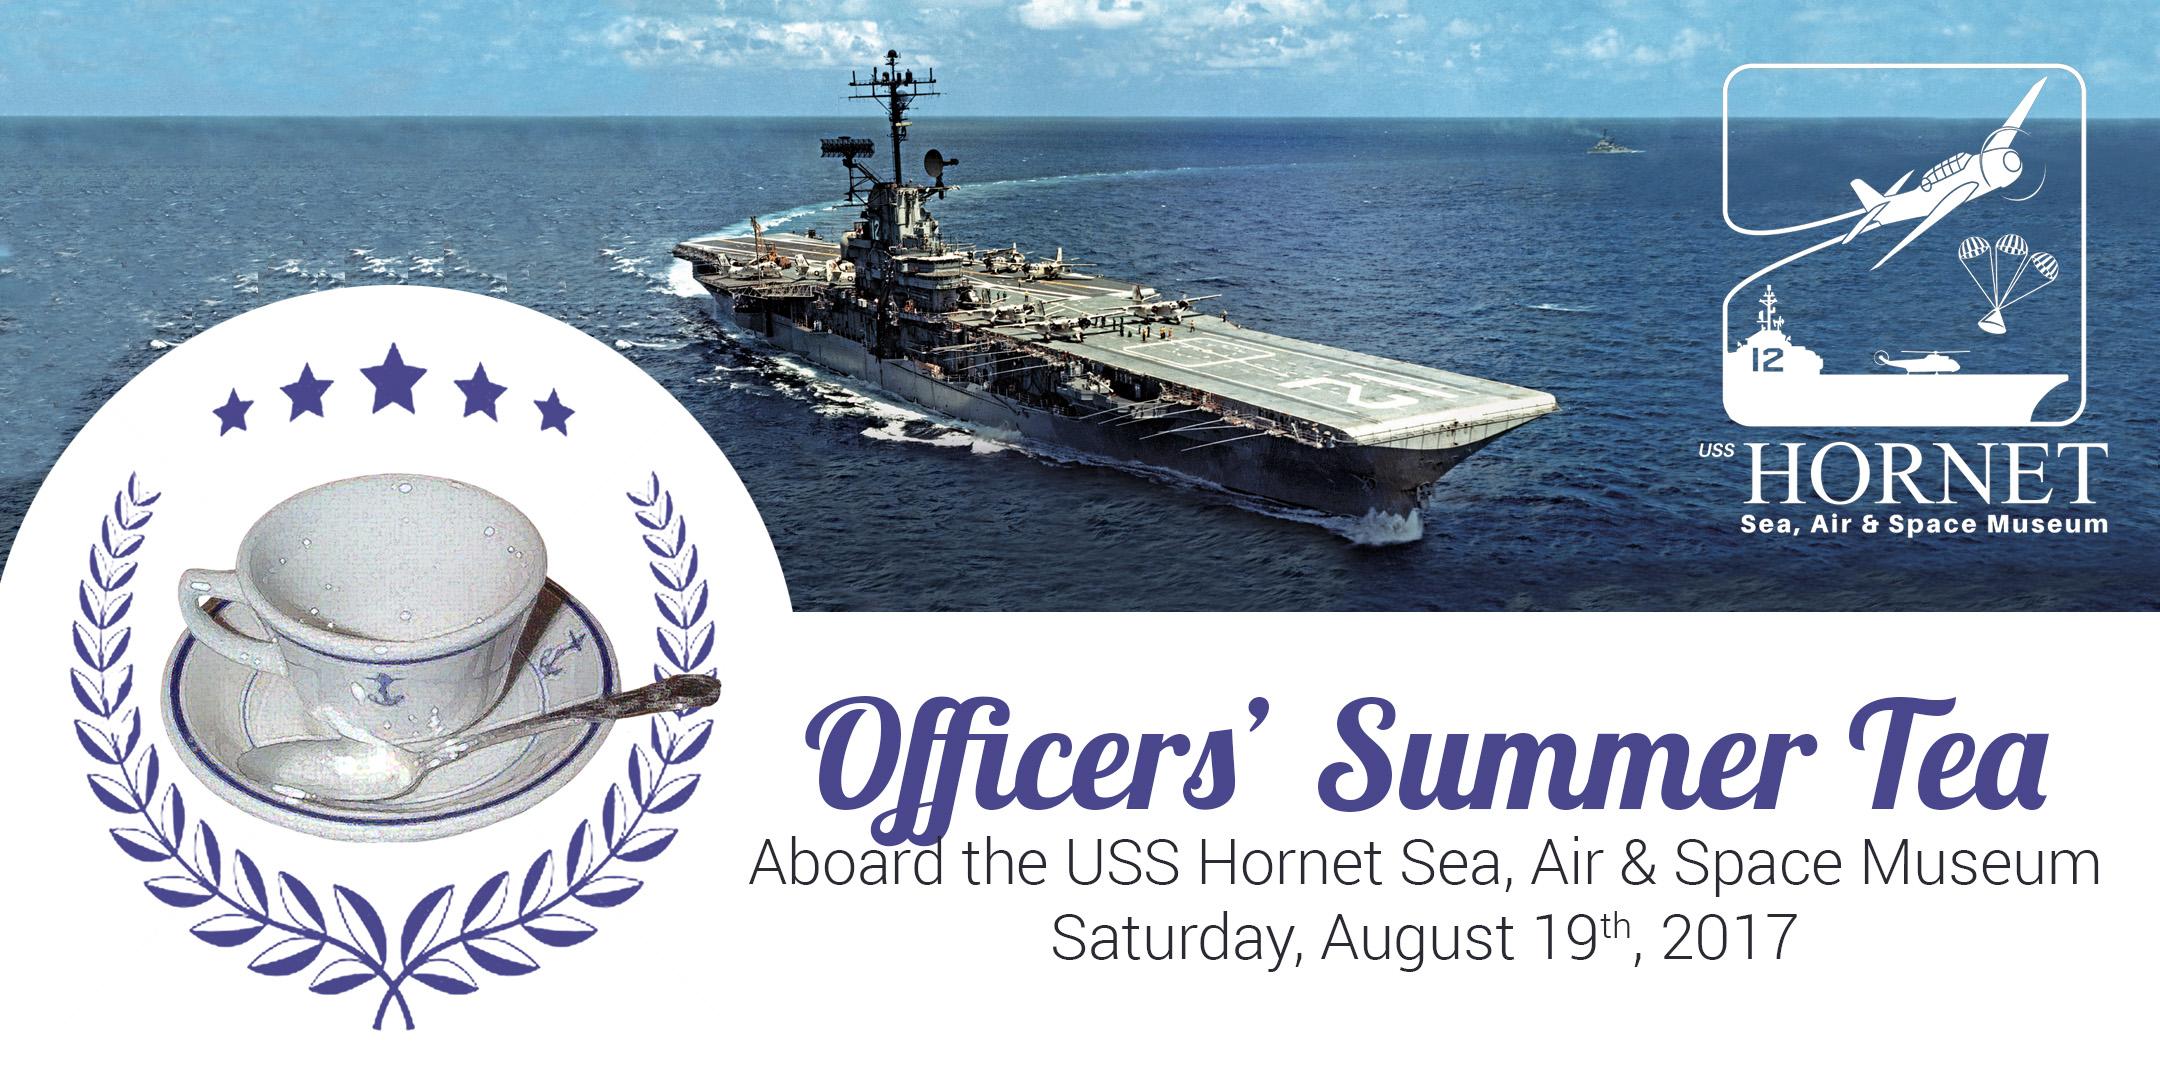 2017-OfficersSummerTea-Eventbrite Image